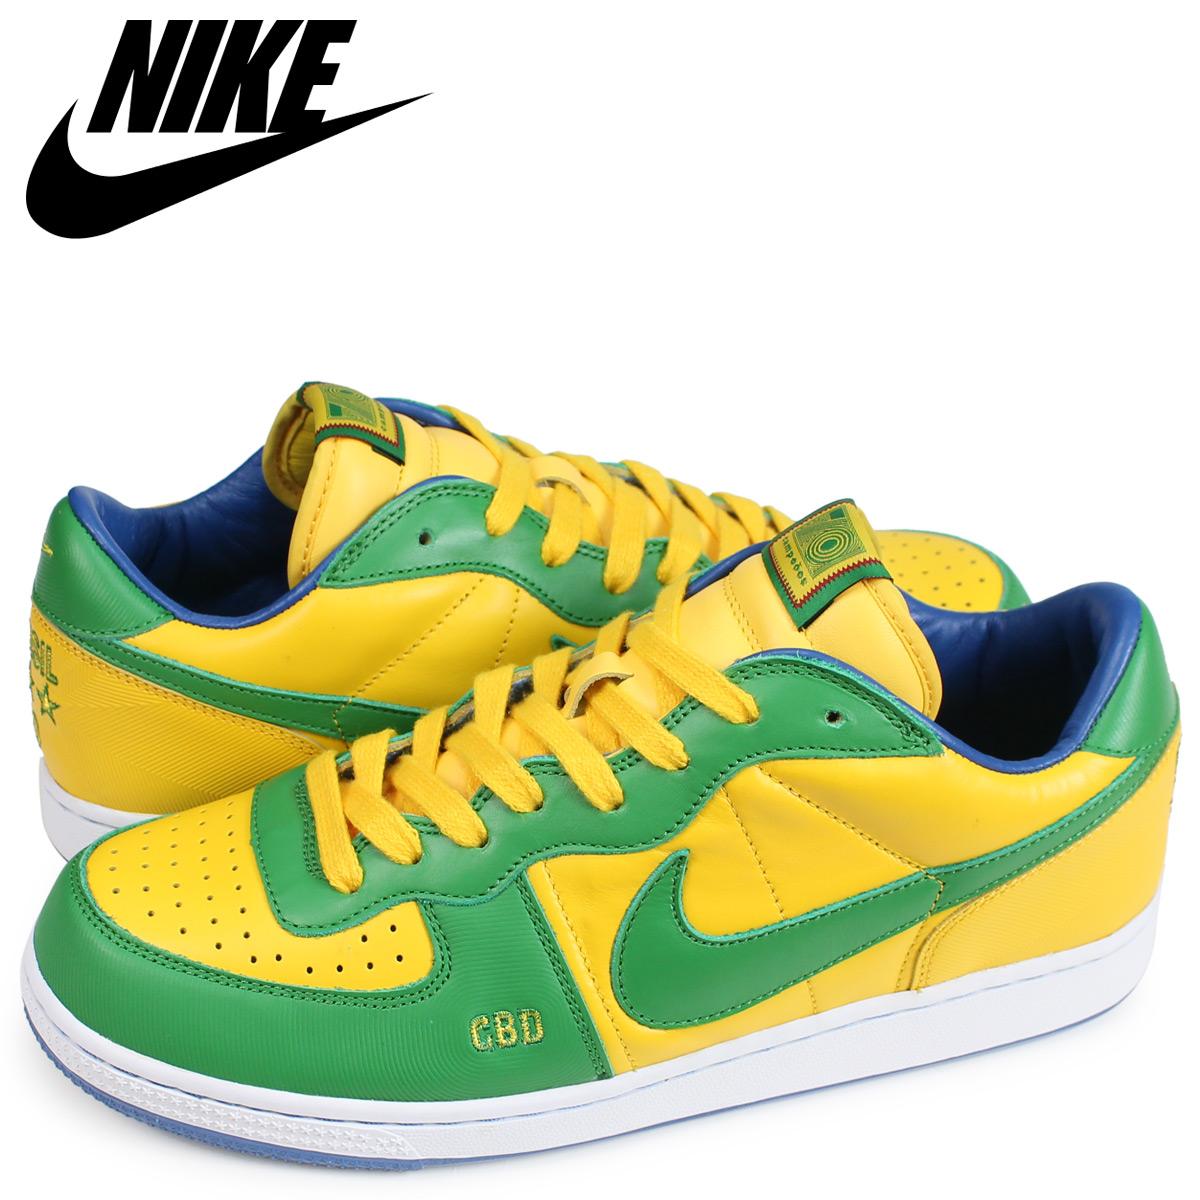 sneakers for cheap 48c70 82866 NIKE Nike terminator sneakers men ZOOM TERMINATOR LOW yellow 310,208-371